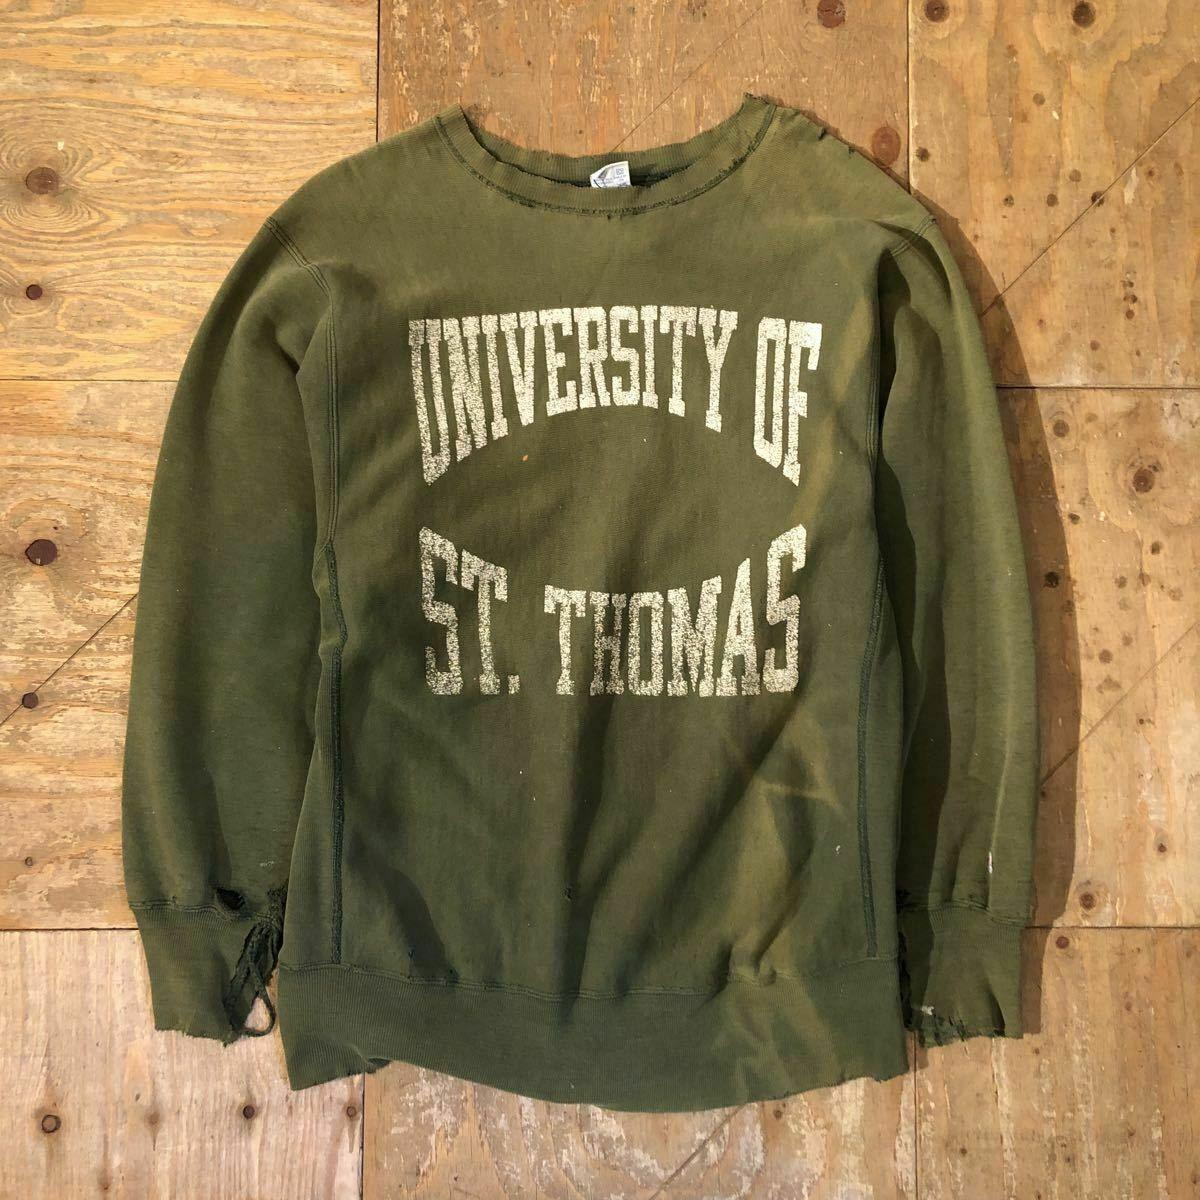 Champion Reverse Weave Crew Neck 90s Vintage Sweatshirt St Thomas Green Men S In 2021 Vintage Sweatshirt Champion Reverse Weave Long Sleeve Tshirt Men [ 1200 x 1200 Pixel ]